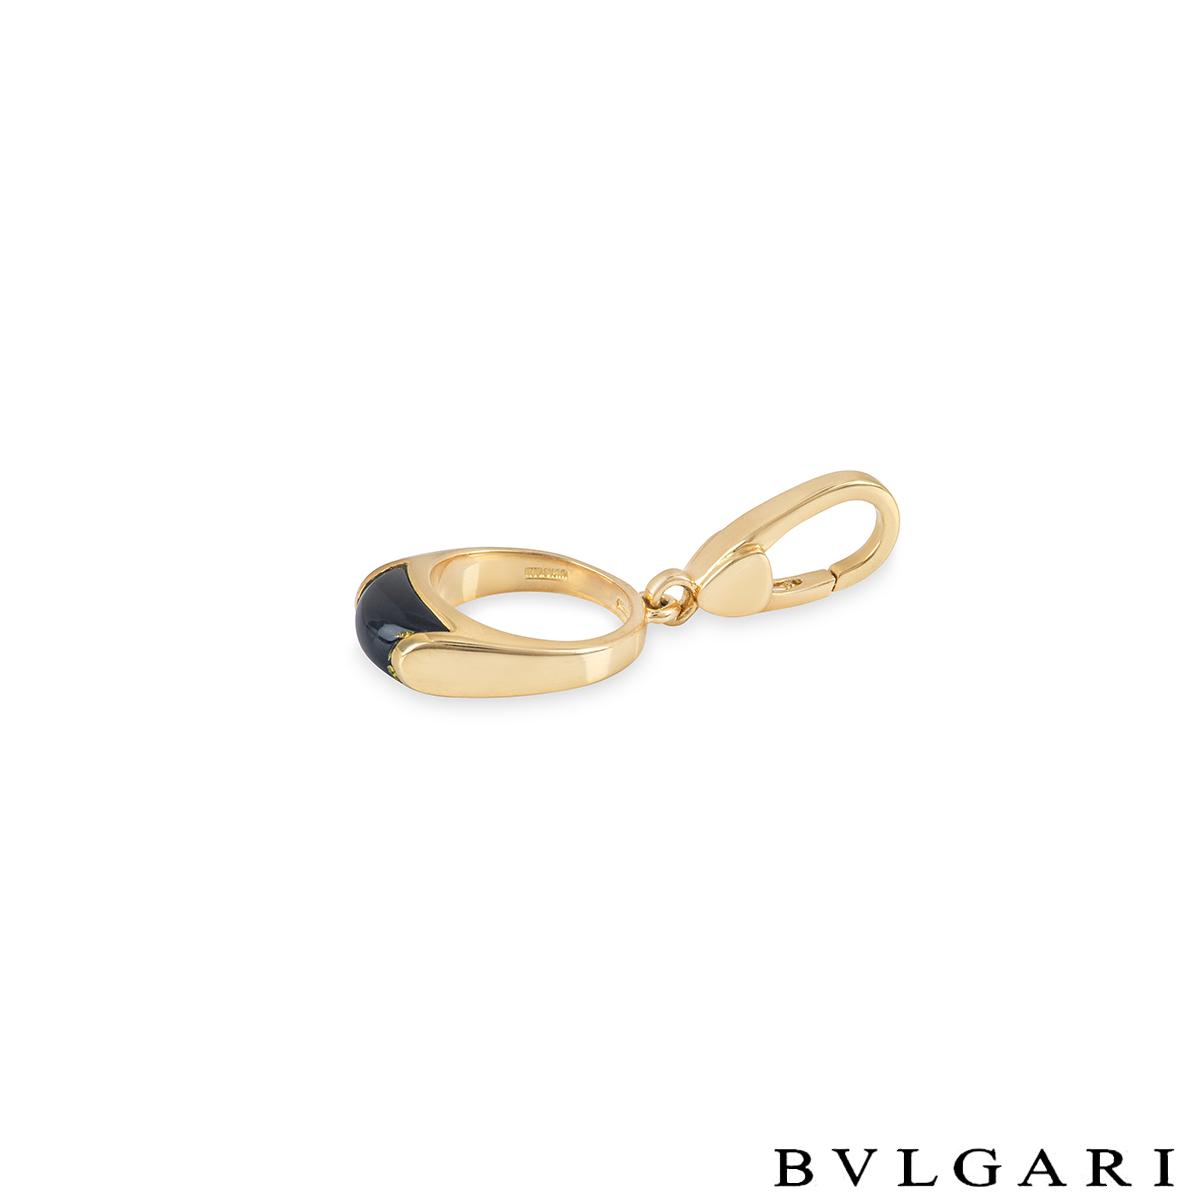 BvlgariYellow Gold Onyx Charm Pendant